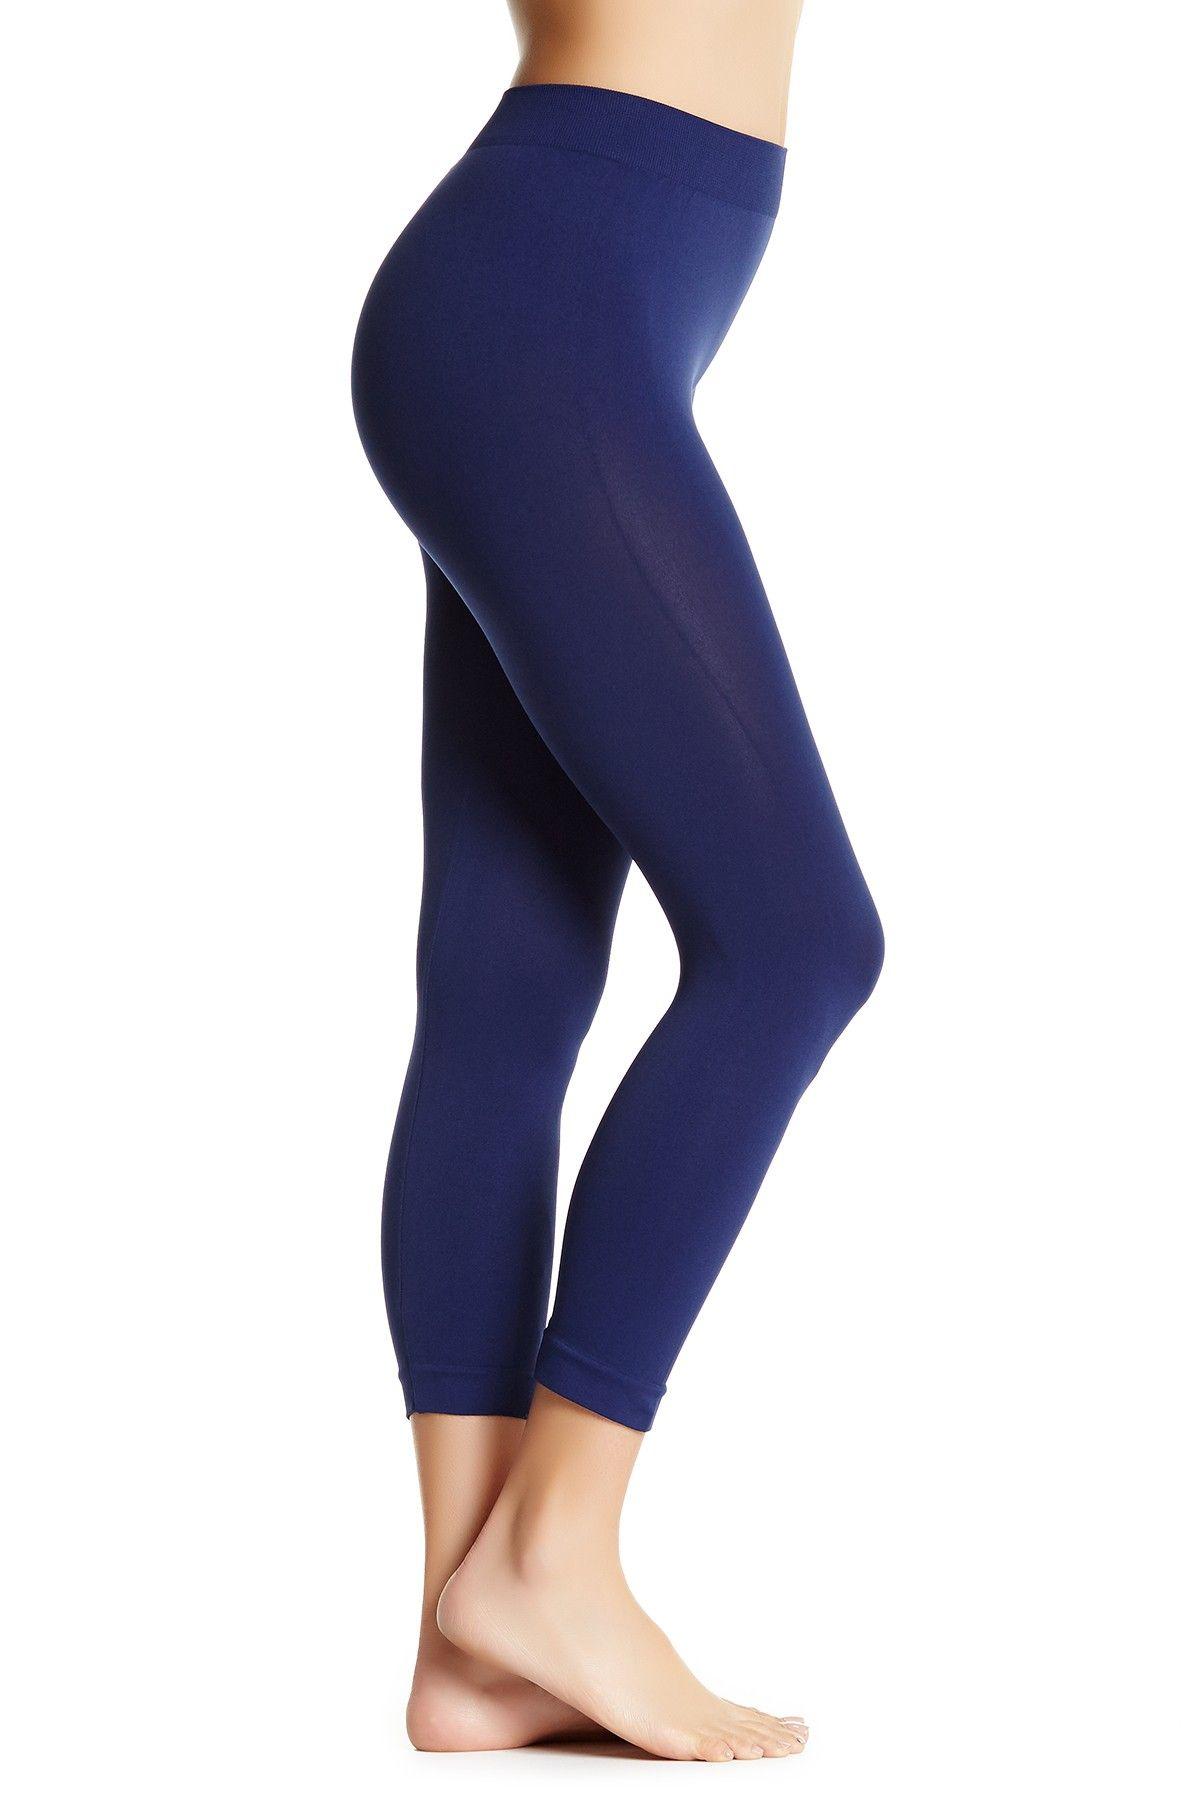 NikiBiki Capri Leggings | Capri leggings and Products